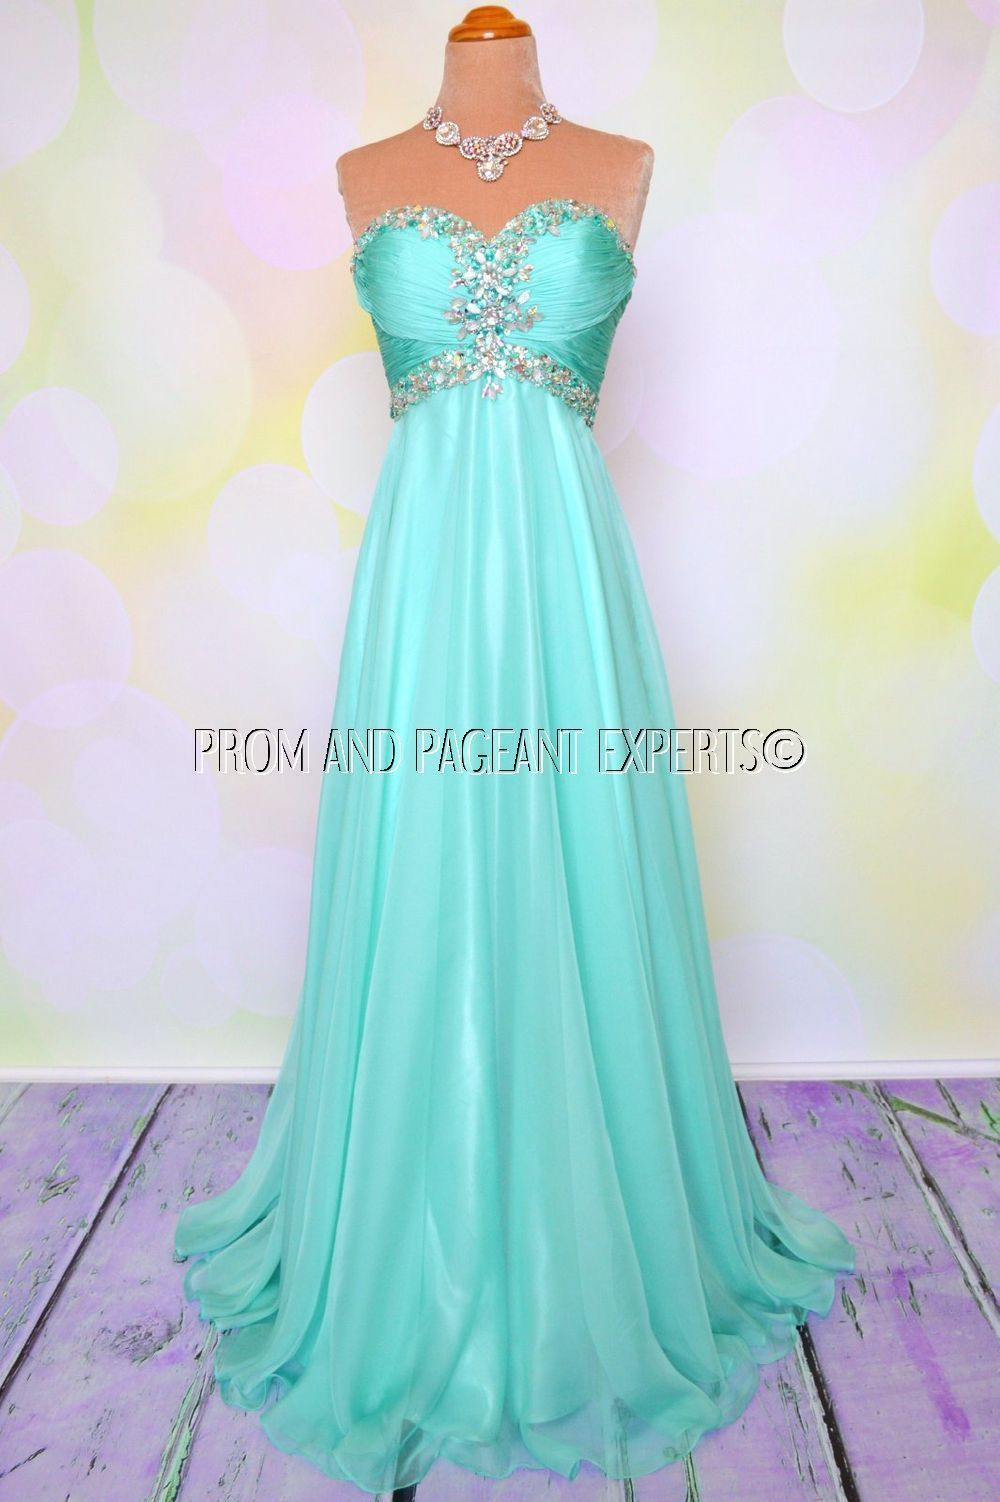 Gorgeous mint teal prom dress | Gorgeous Prom Dresses | Pinterest ...